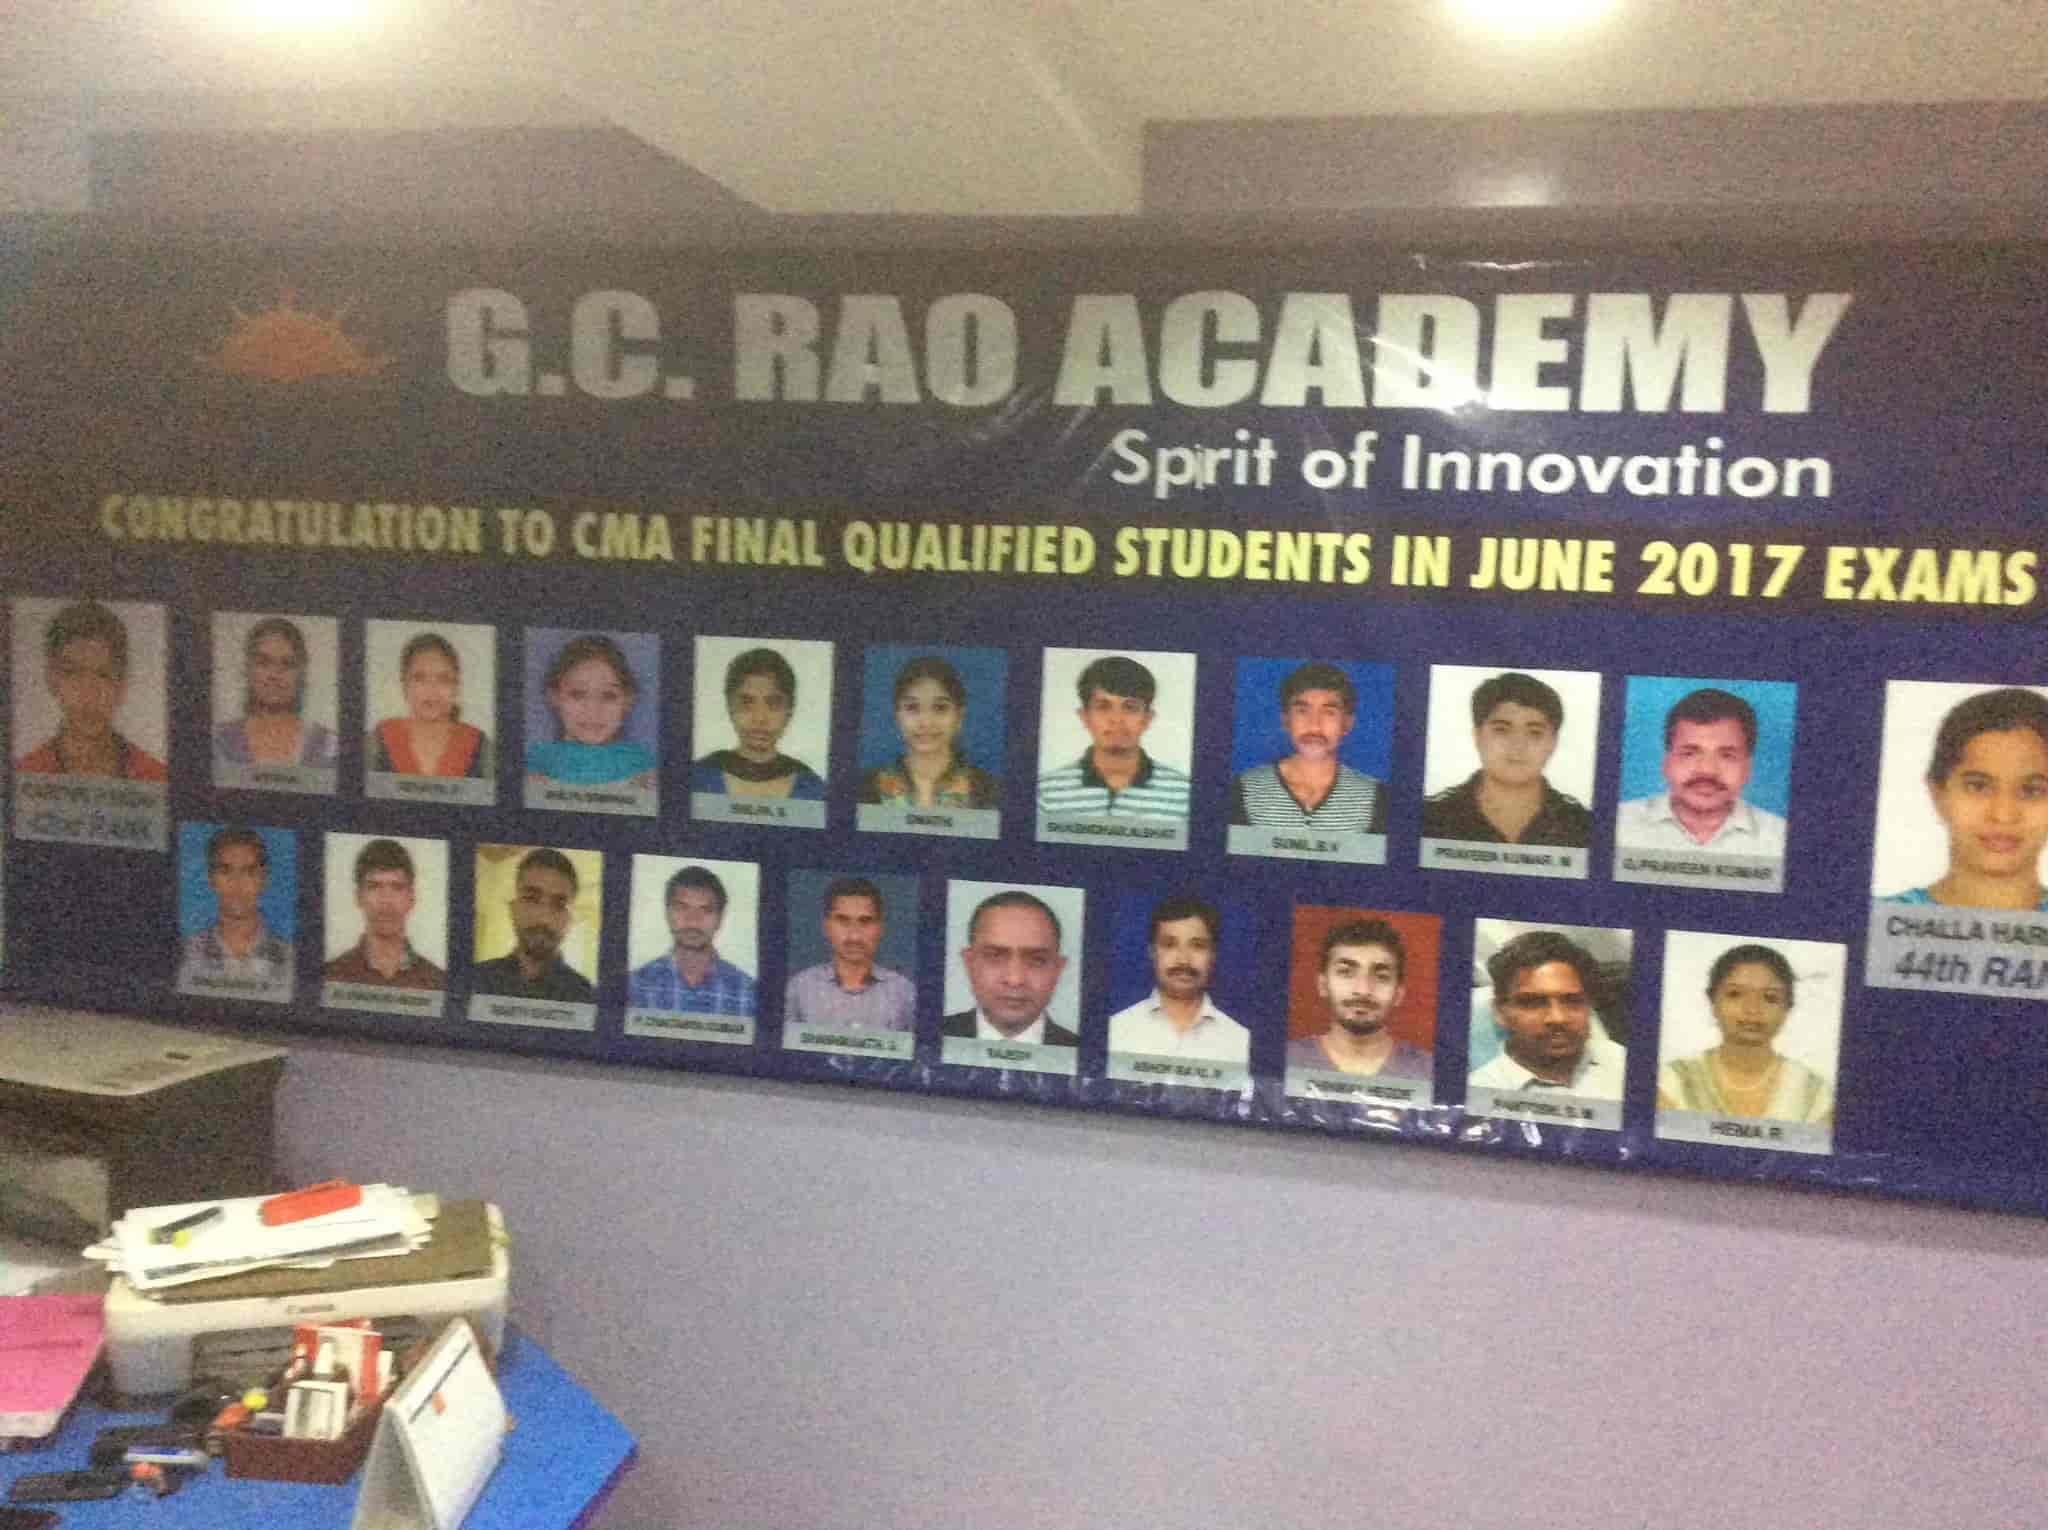 Raos coaching center reviews, malleswaram, bangalore 296 ratings.